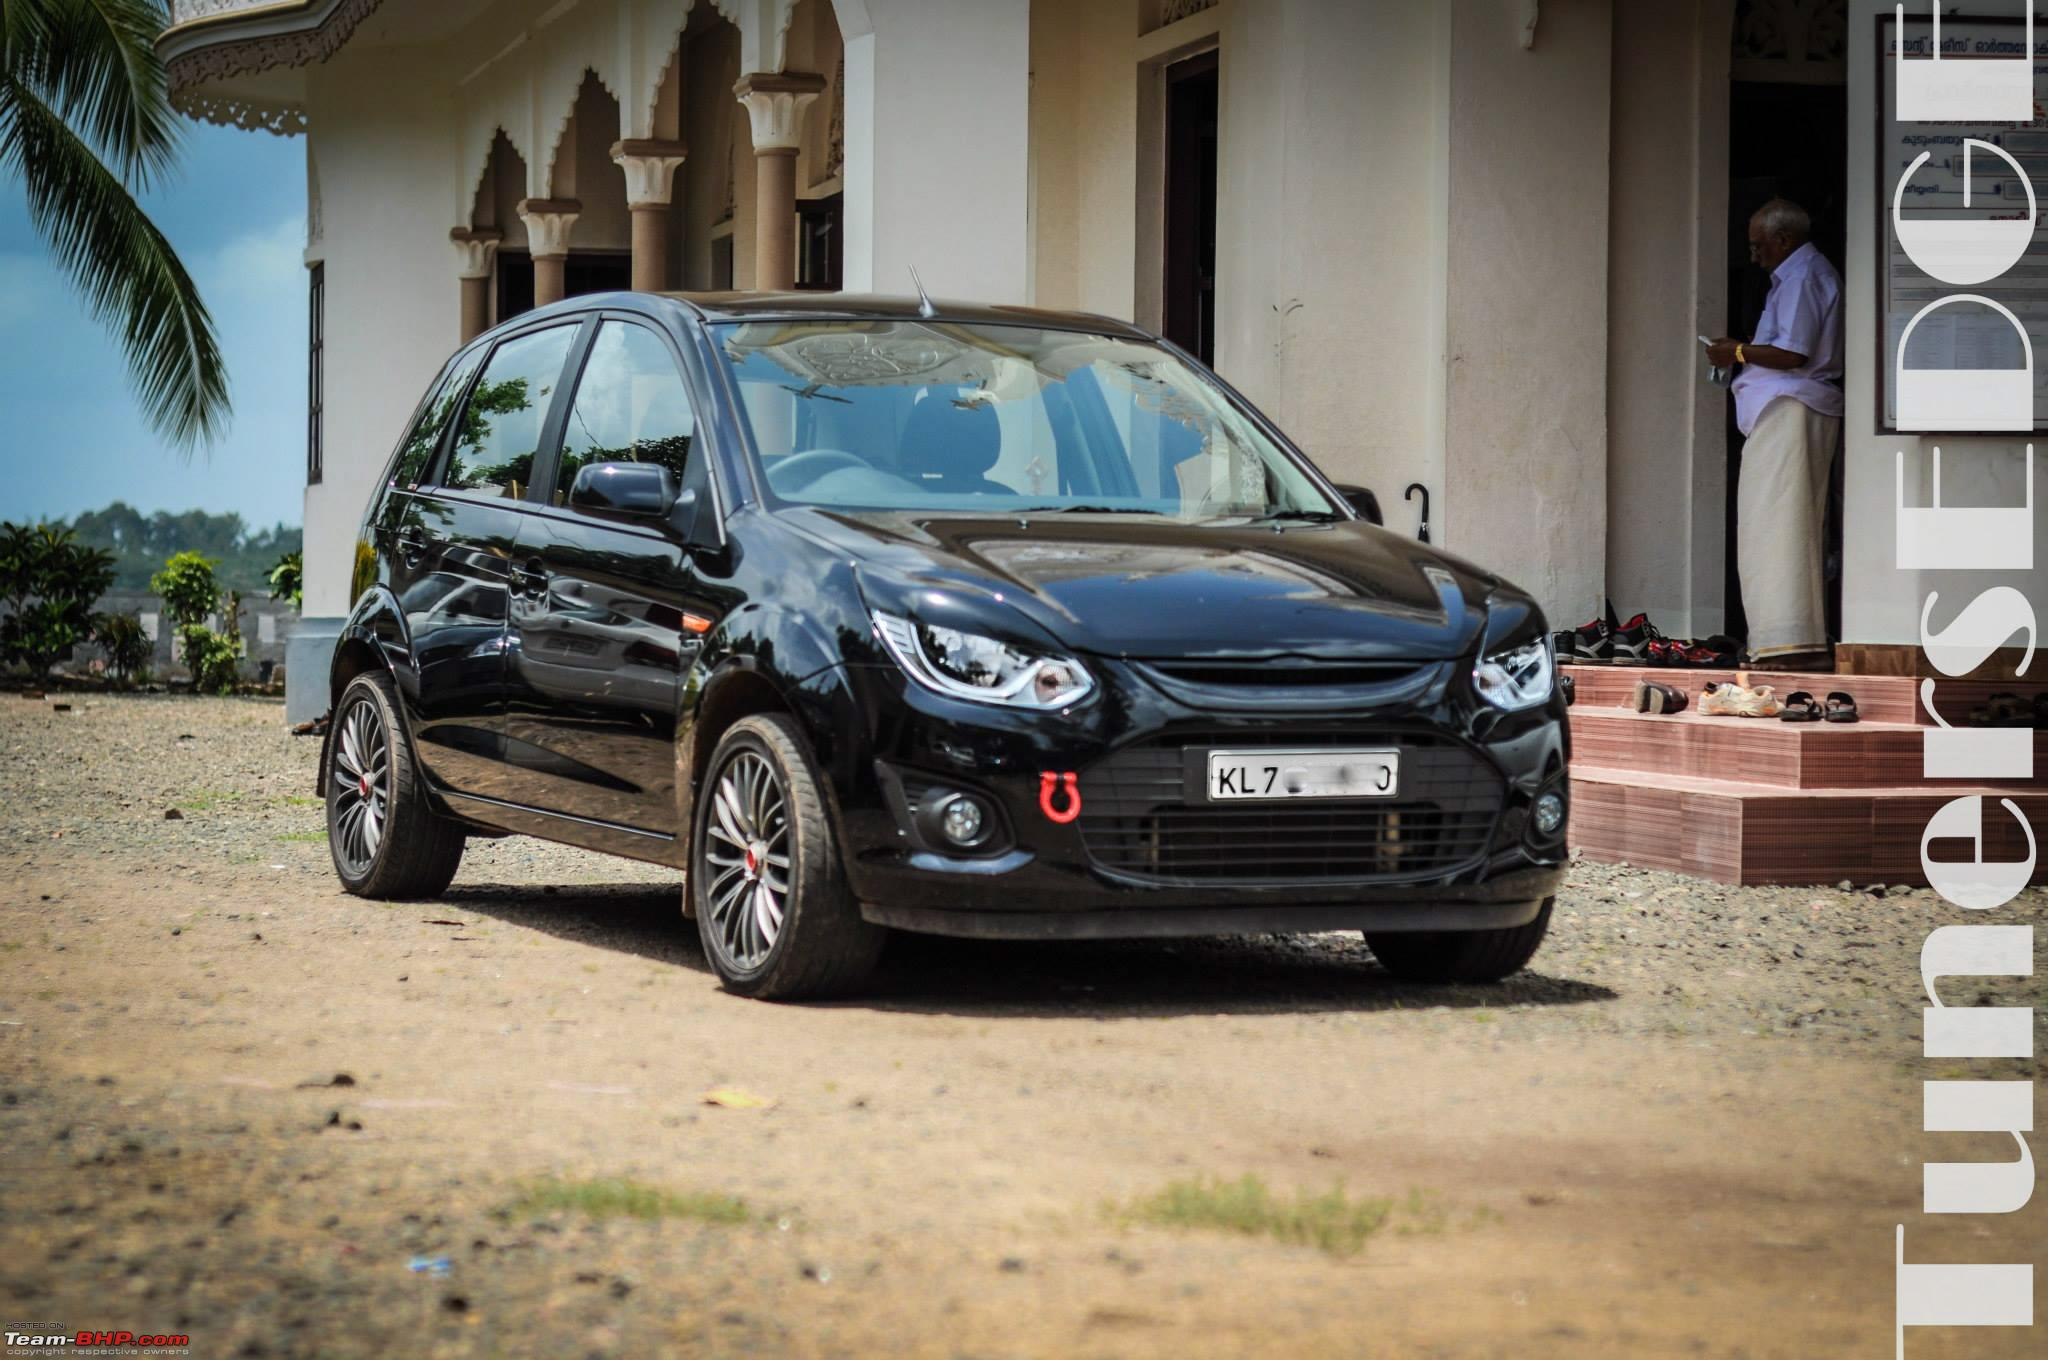 Pics tastefully modified cars in india 1014723_483391191739091_574824032_o jpg